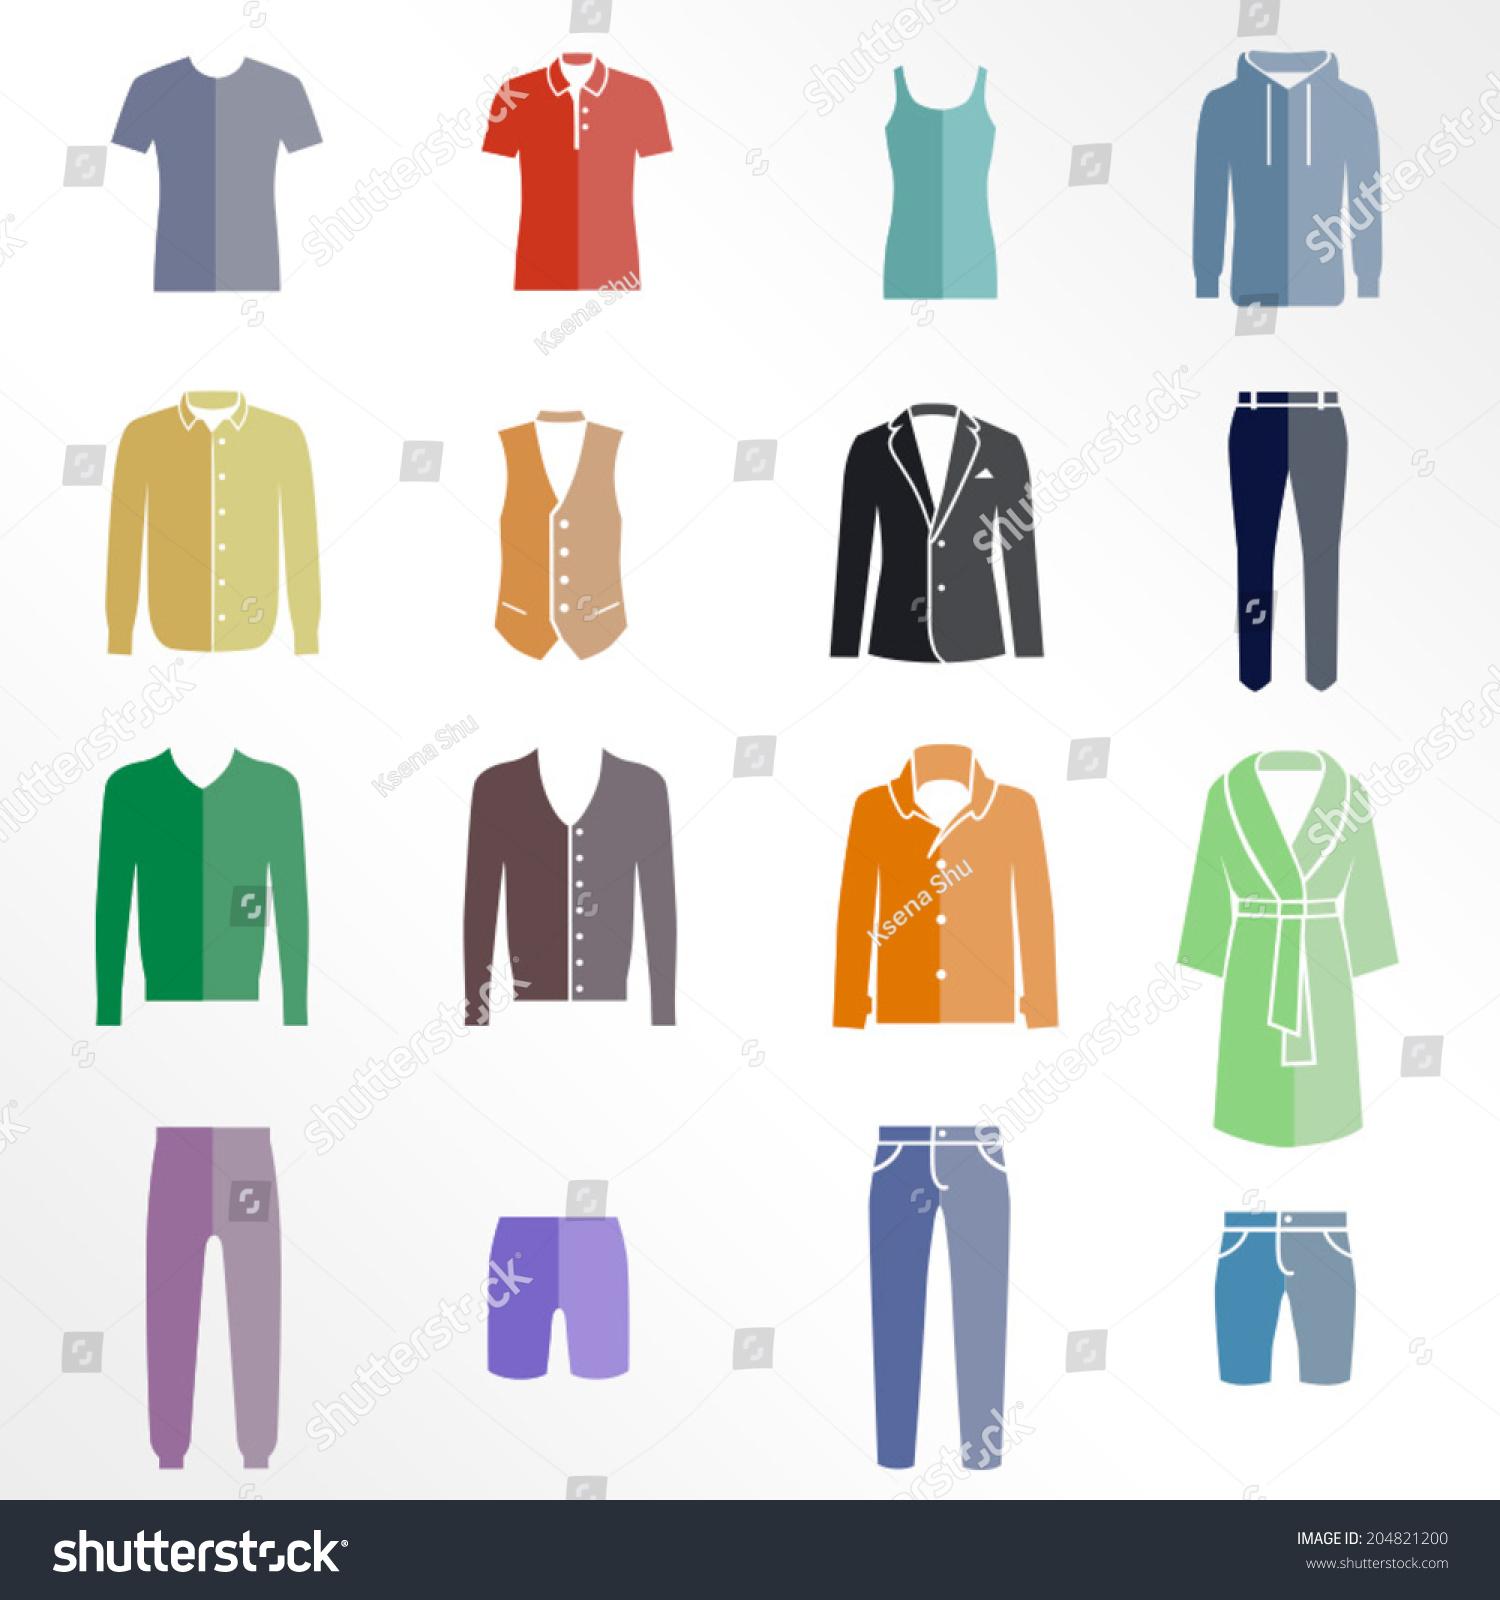 Different Types Of Mens T Shirts Carrerasconfuturo Com